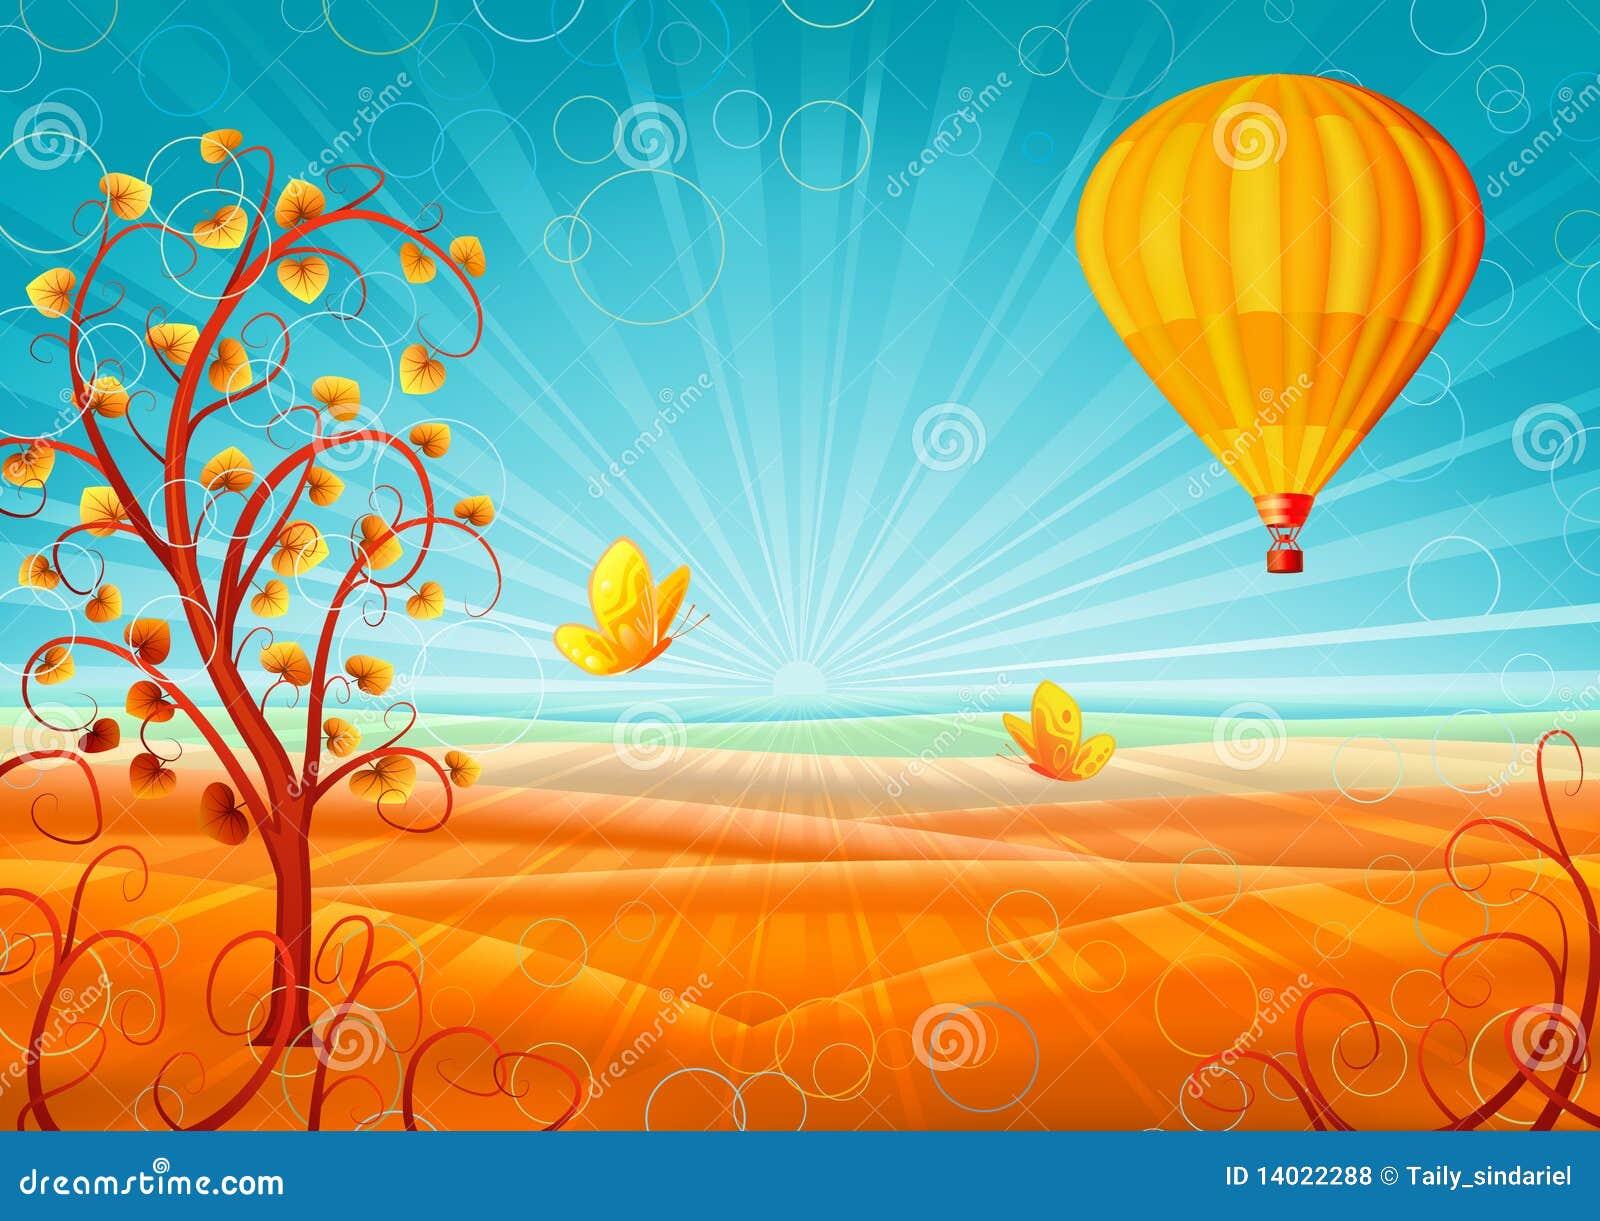 Inspirational Fantastic Autumn Balloon hot air balloon